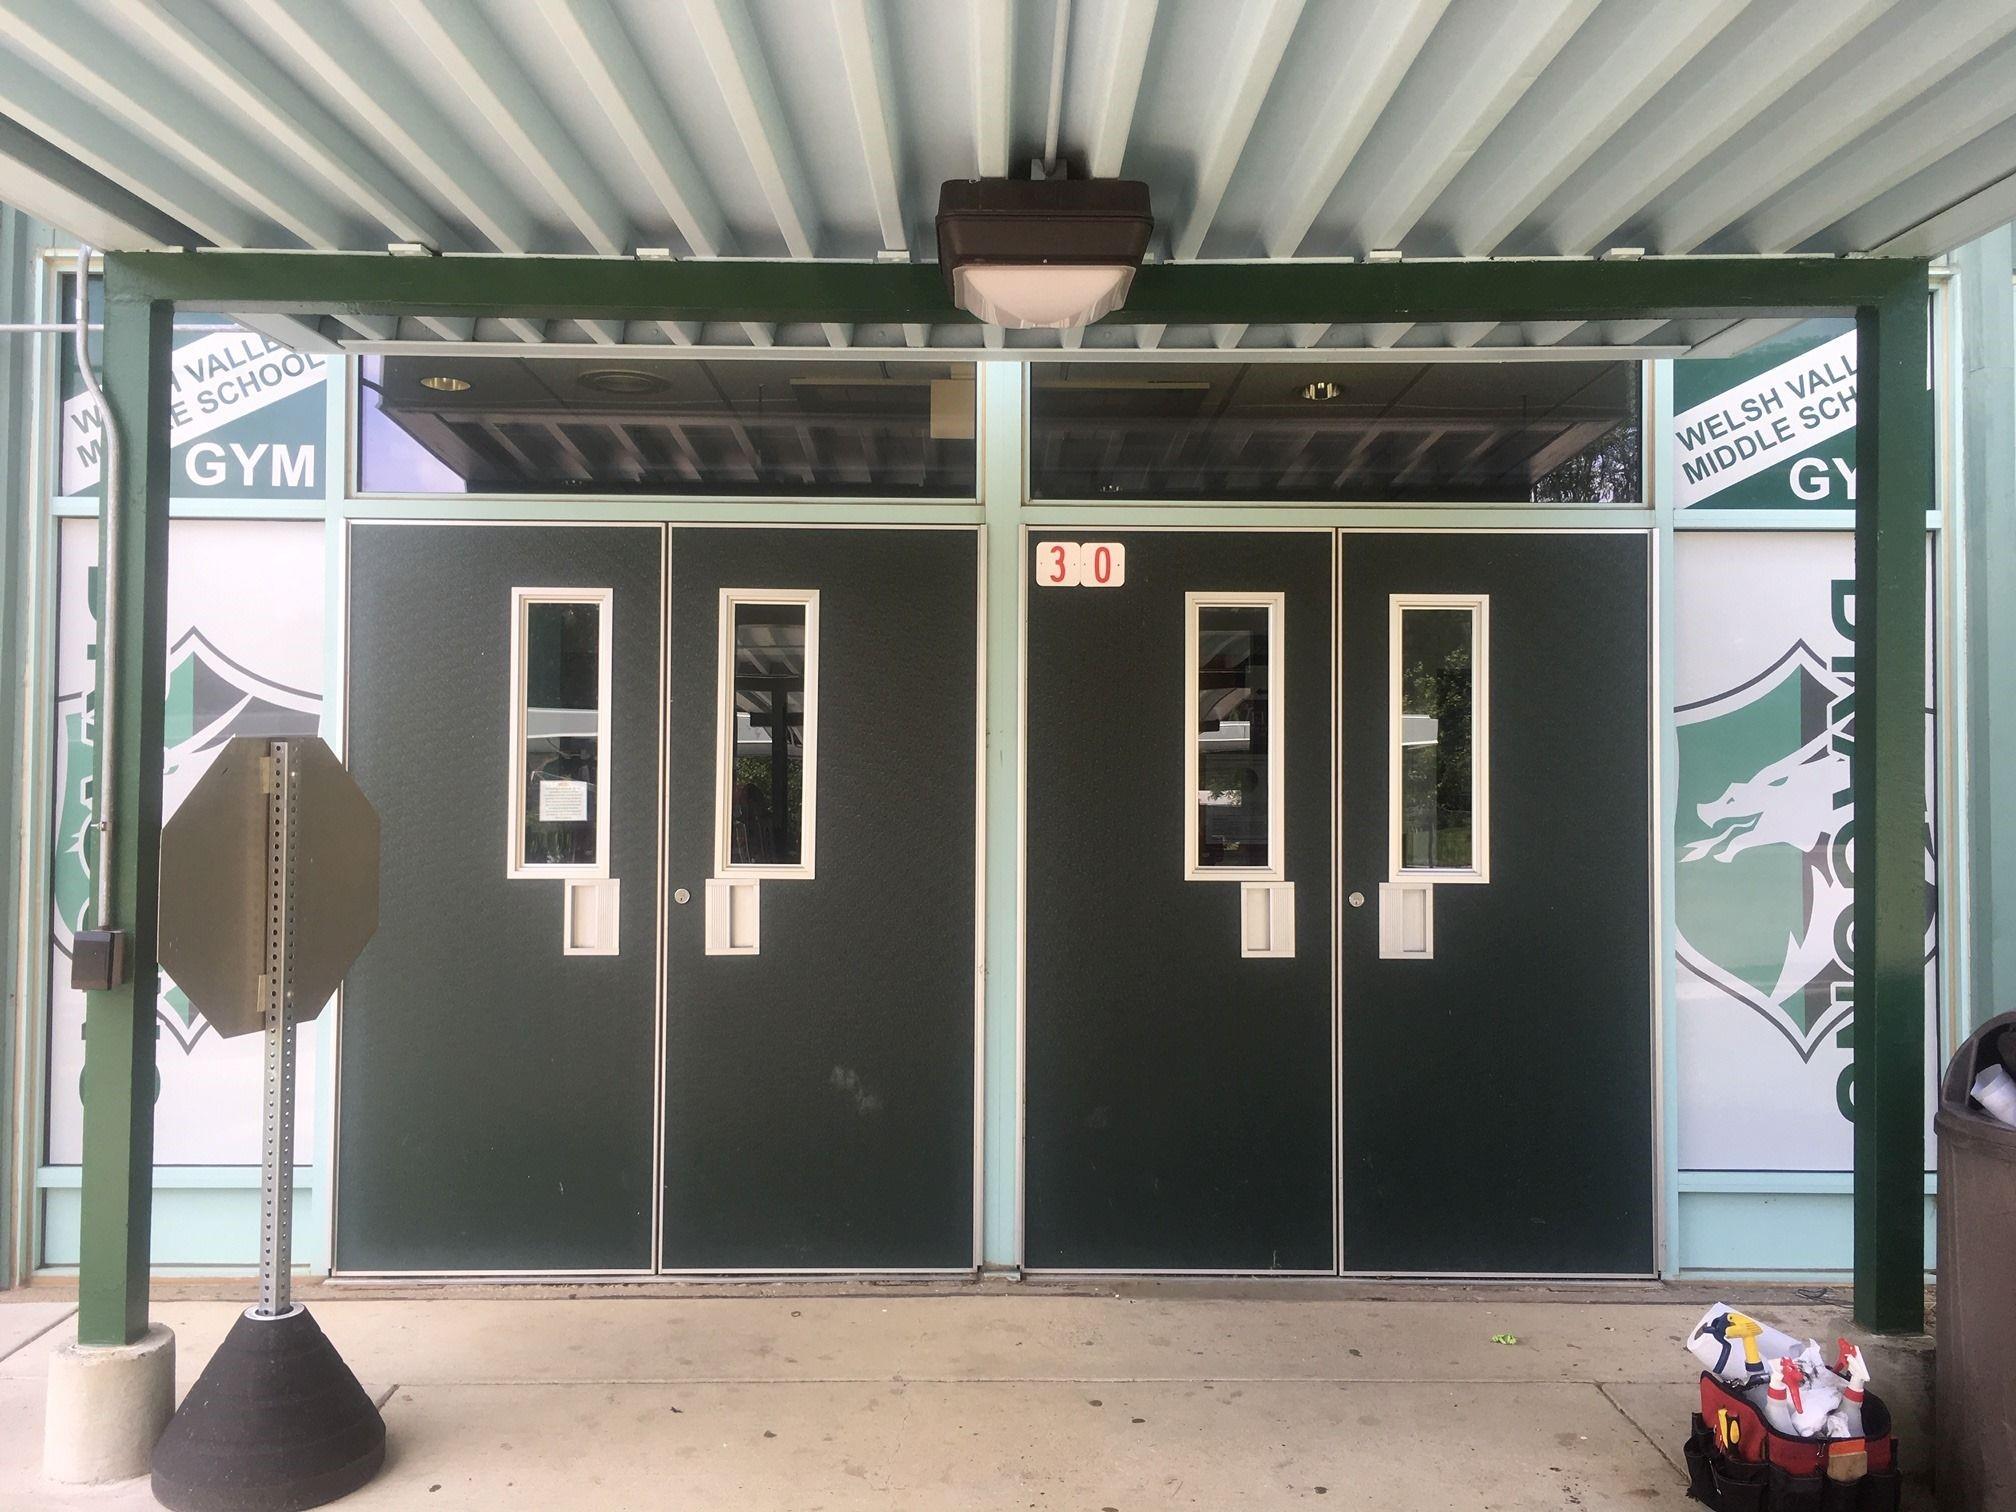 Wall Graphics, Murals, Wallpaper | School, College, & University Signs